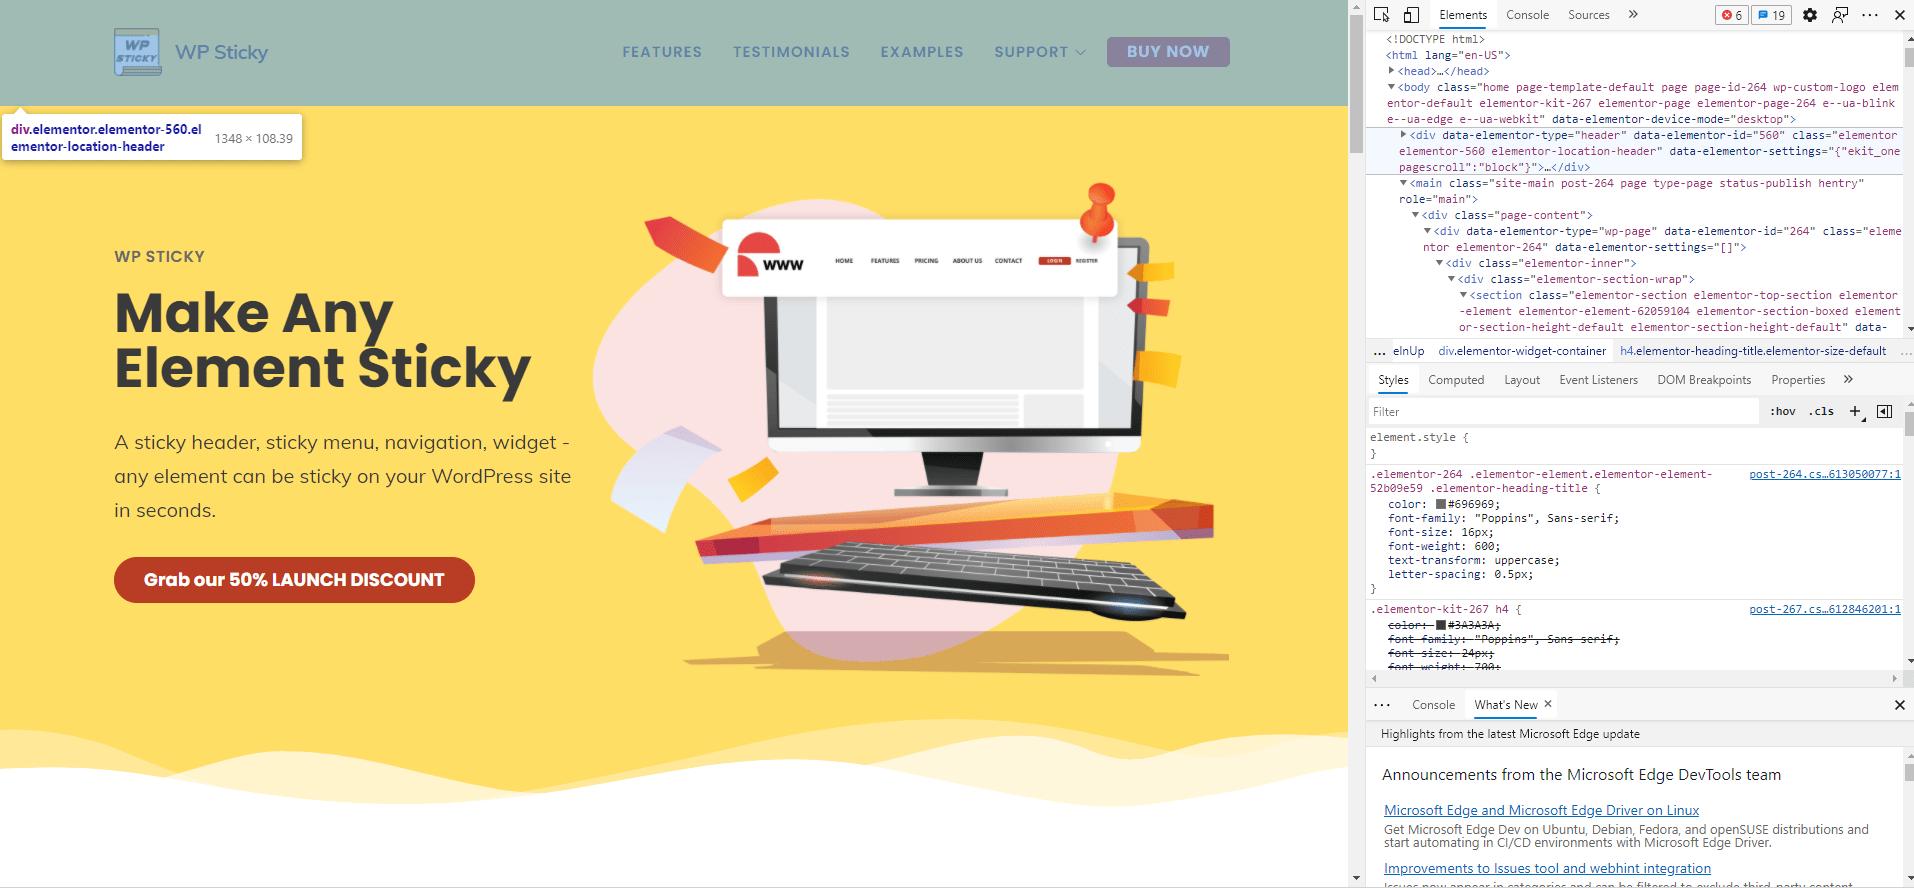 WP Sticky site code